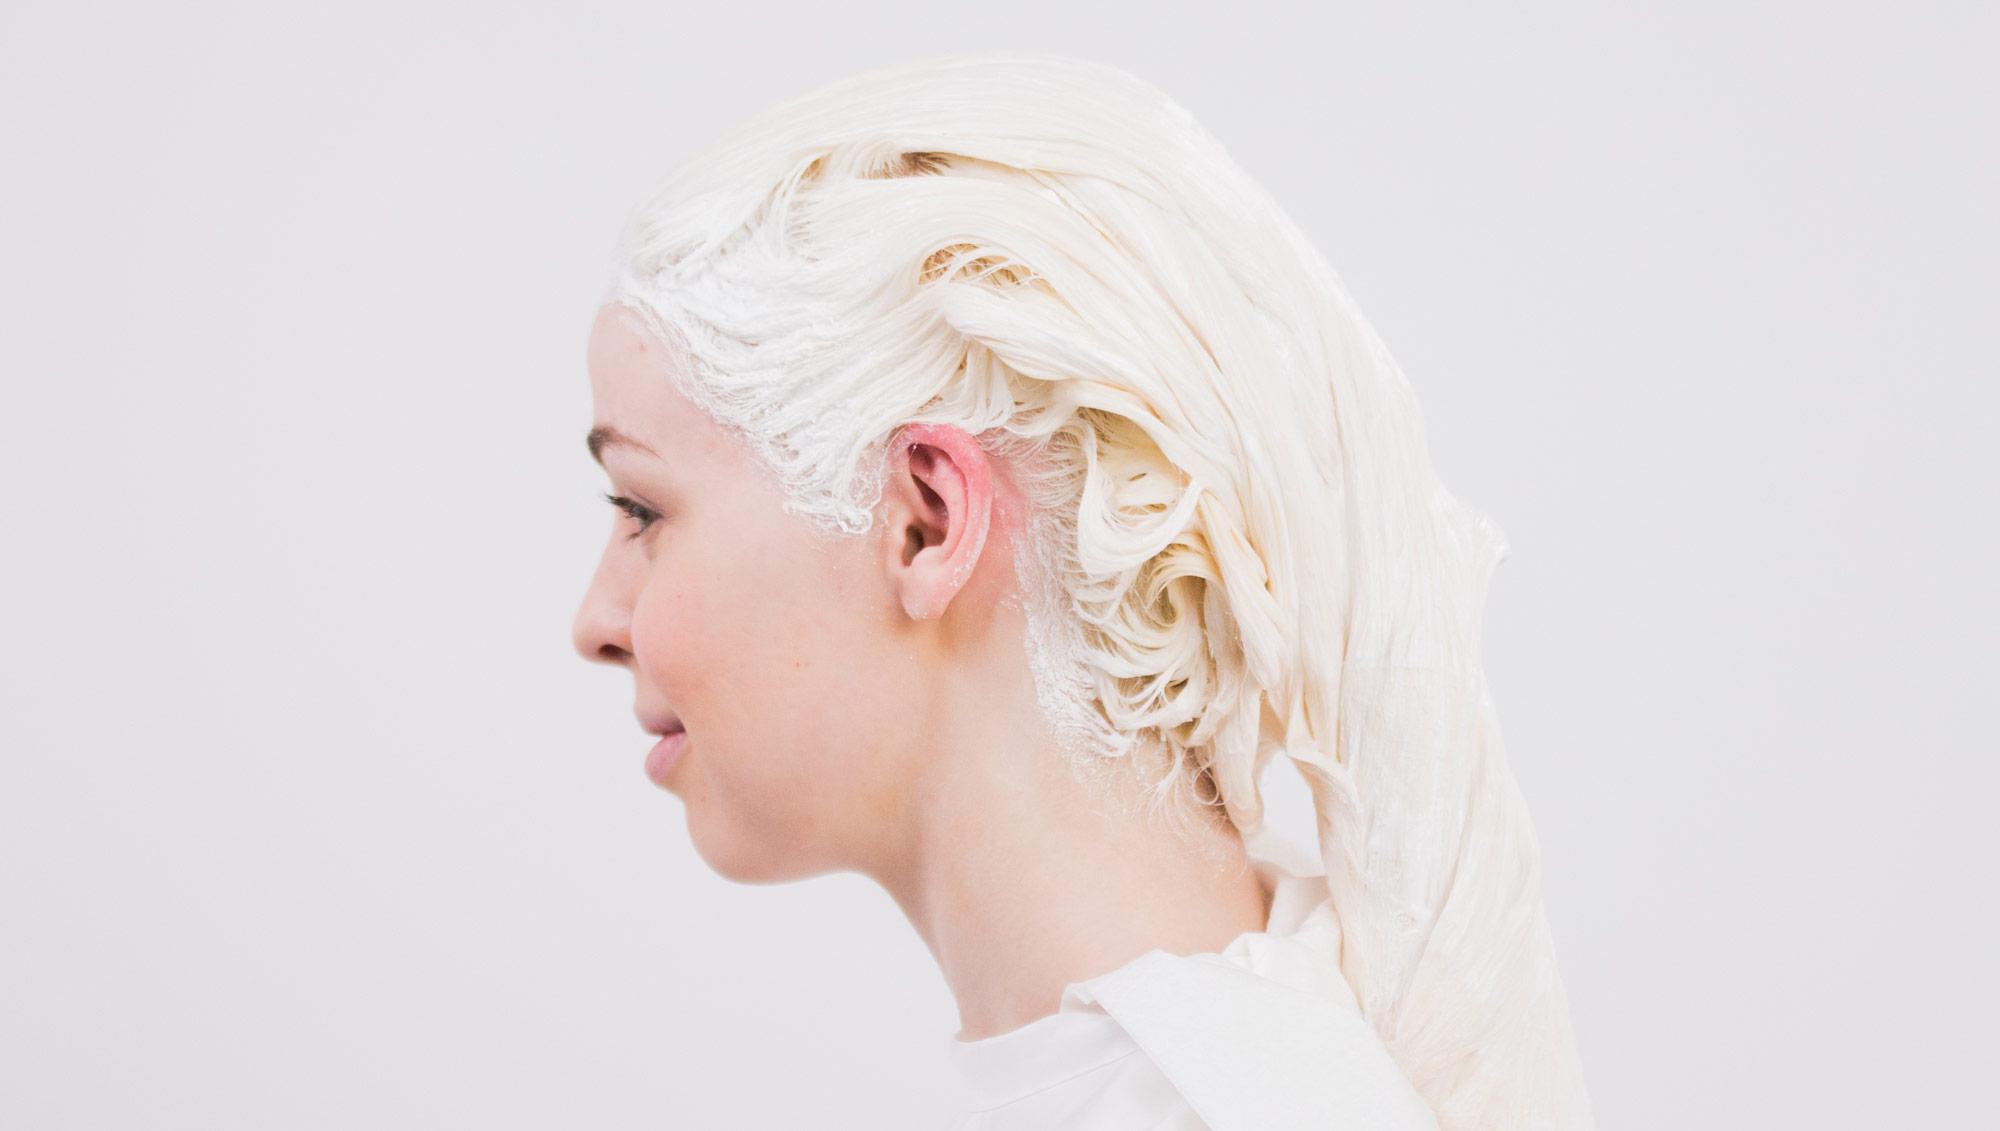 Bleach or lightening hair color?